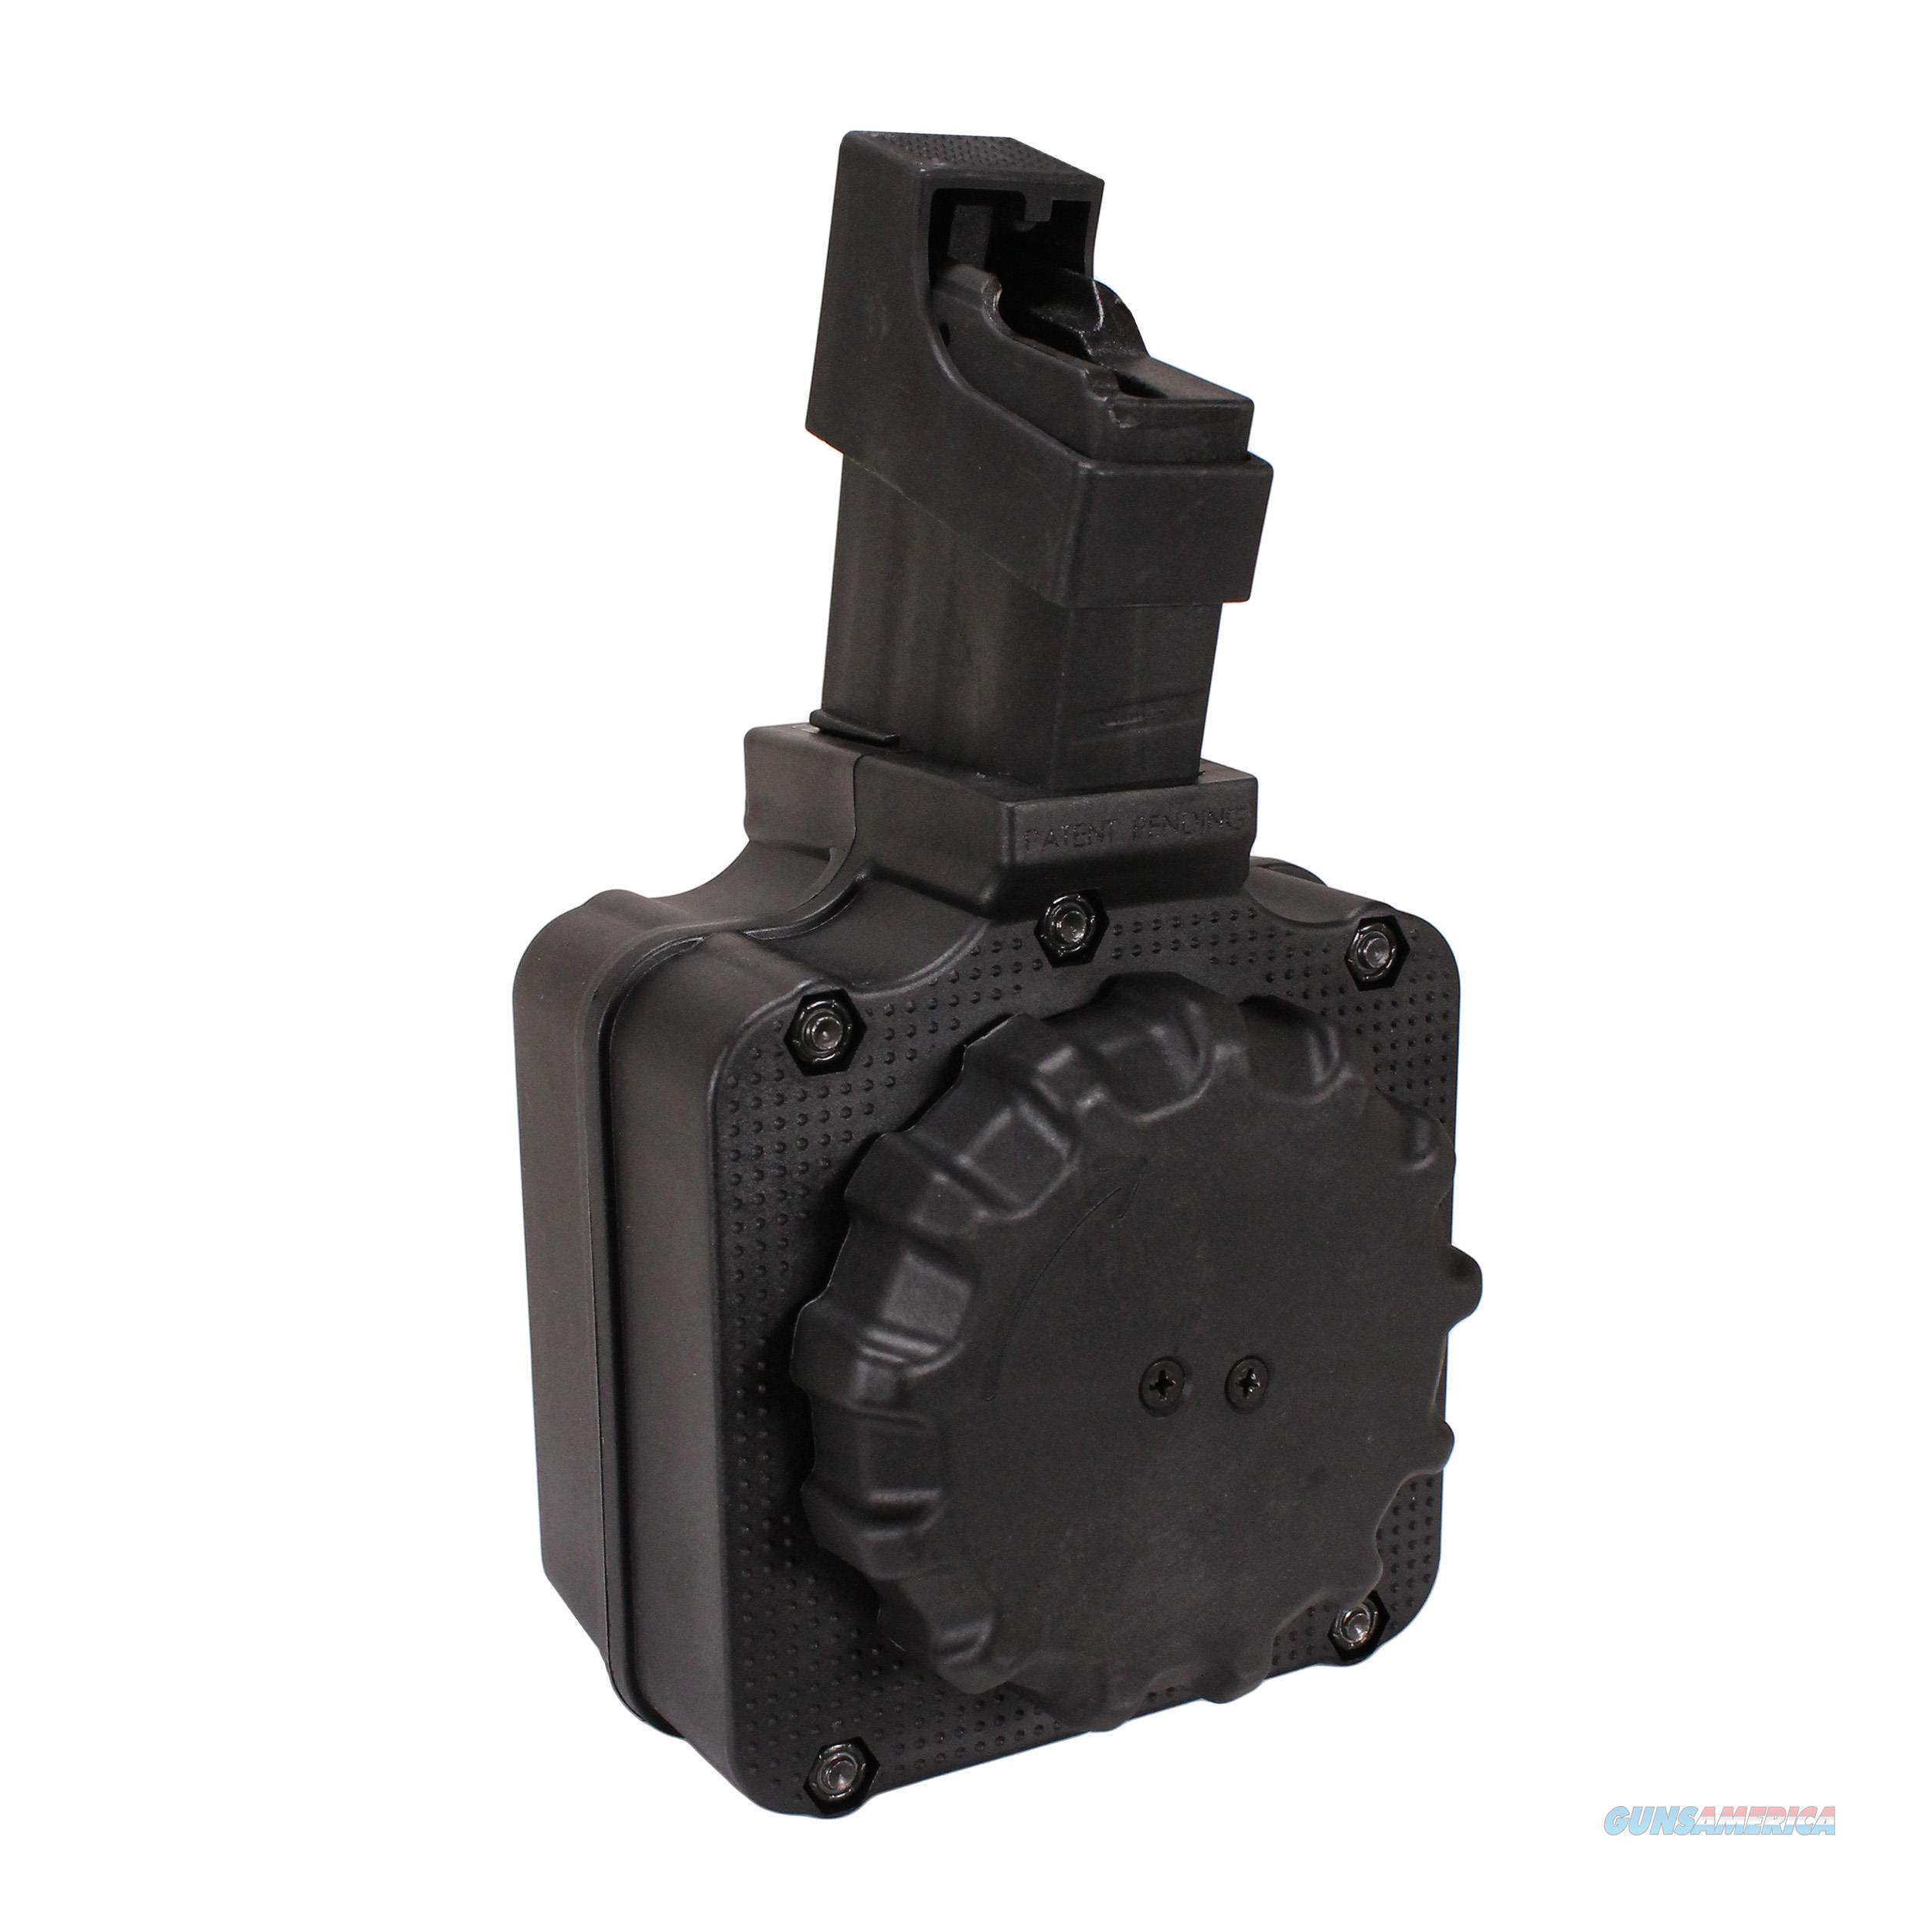 Promag Ar .308 Caliber Magazine DRM-A1  Non-Guns > Magazines & Clips > Rifle Magazines > Other